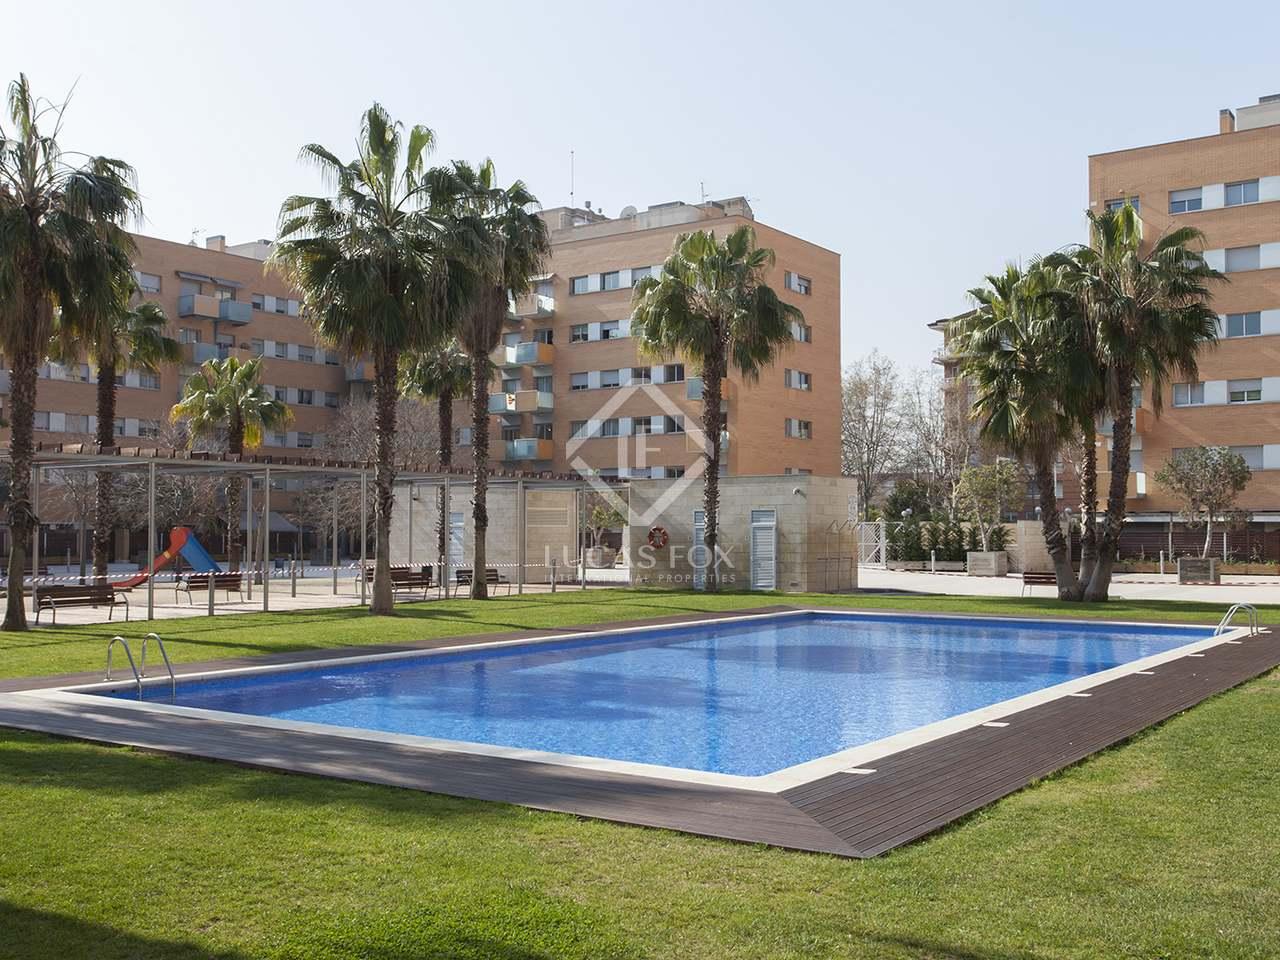 Piso de 65m en alquiler en vila ol mpica barcelona for Piscina olimpica barcelona